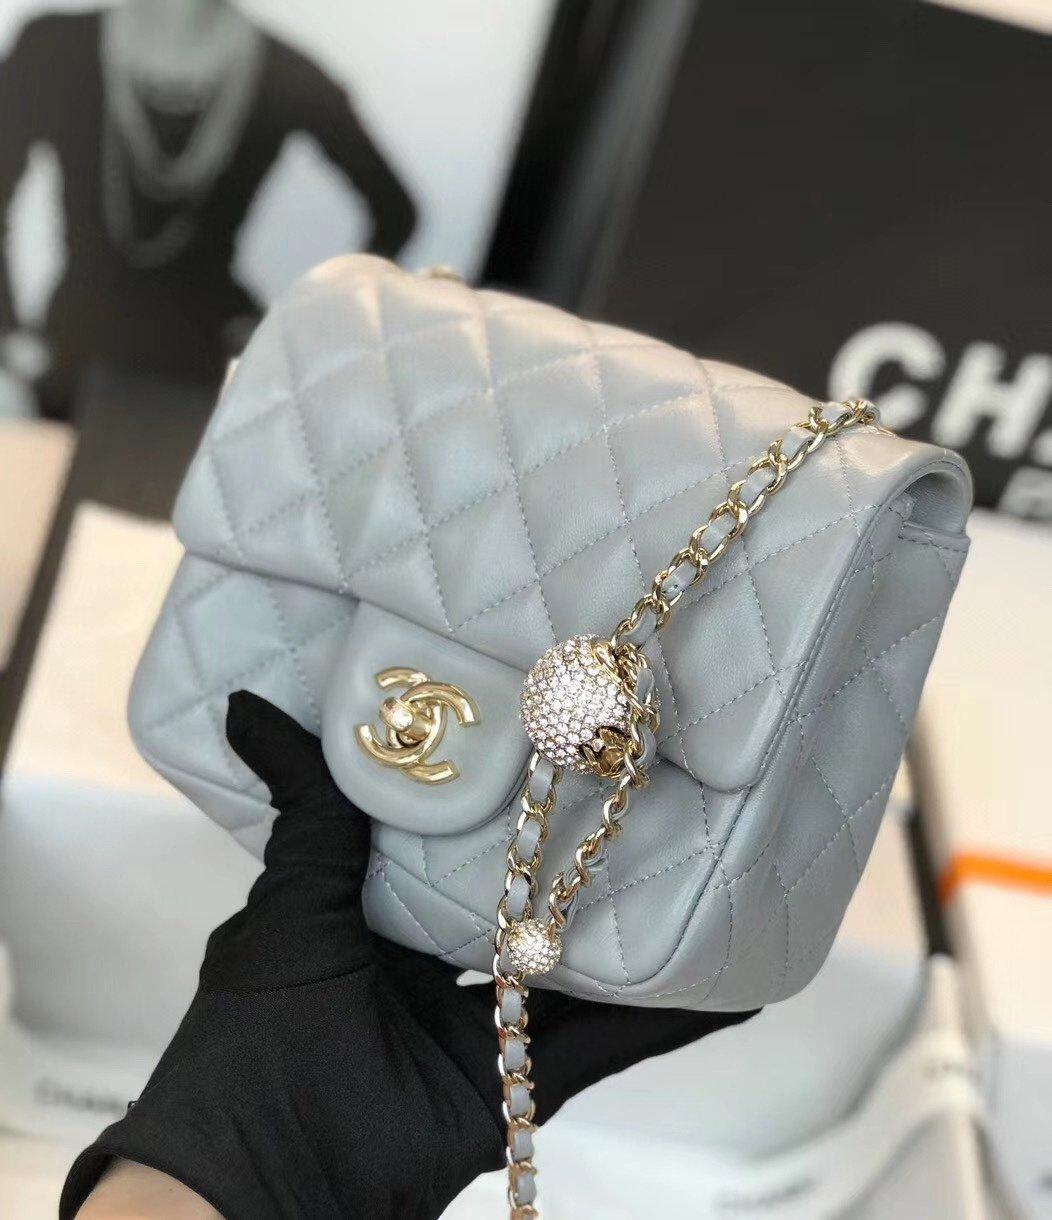 Chanel香奈儿专柜最新钻珠cf款(图8)